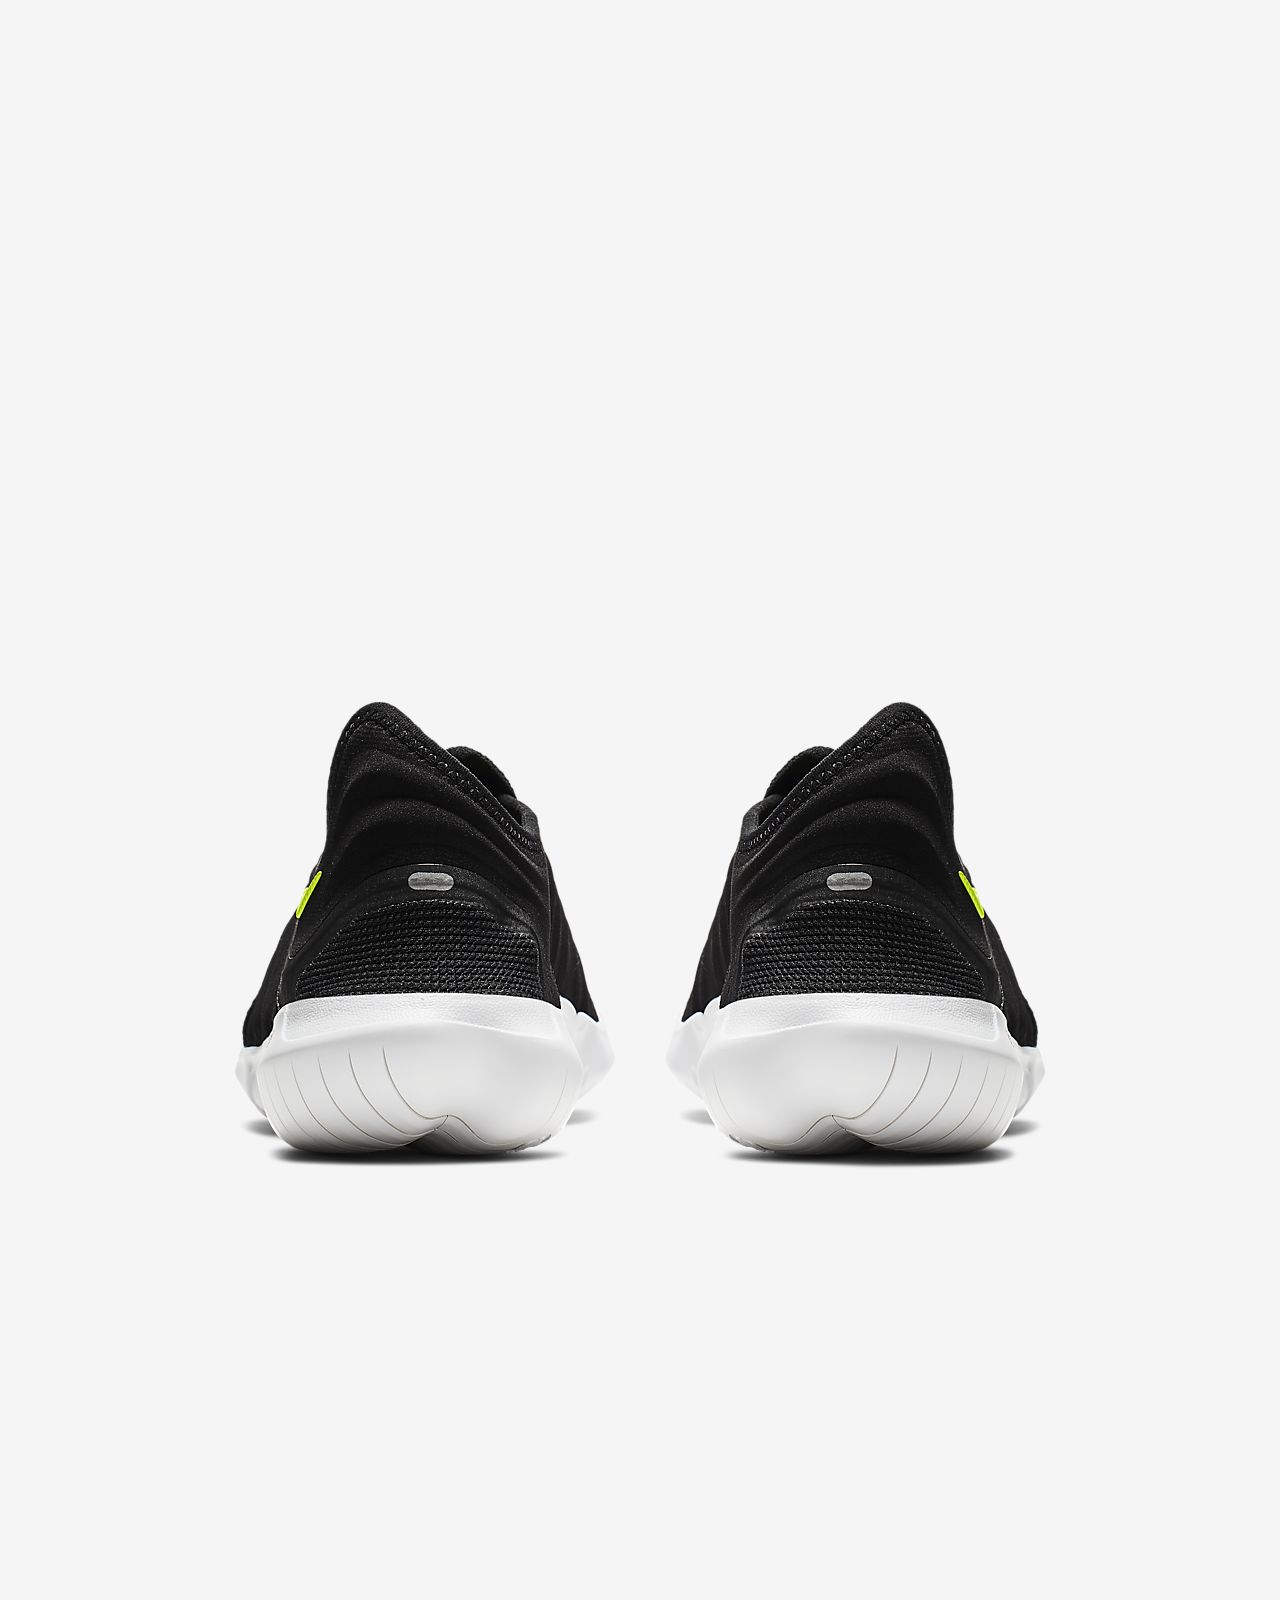 official photos f52a8 bd4dd Nike Free RN Flyknit 3.0 Zapatillas de running - Hombre. Nike.com ES